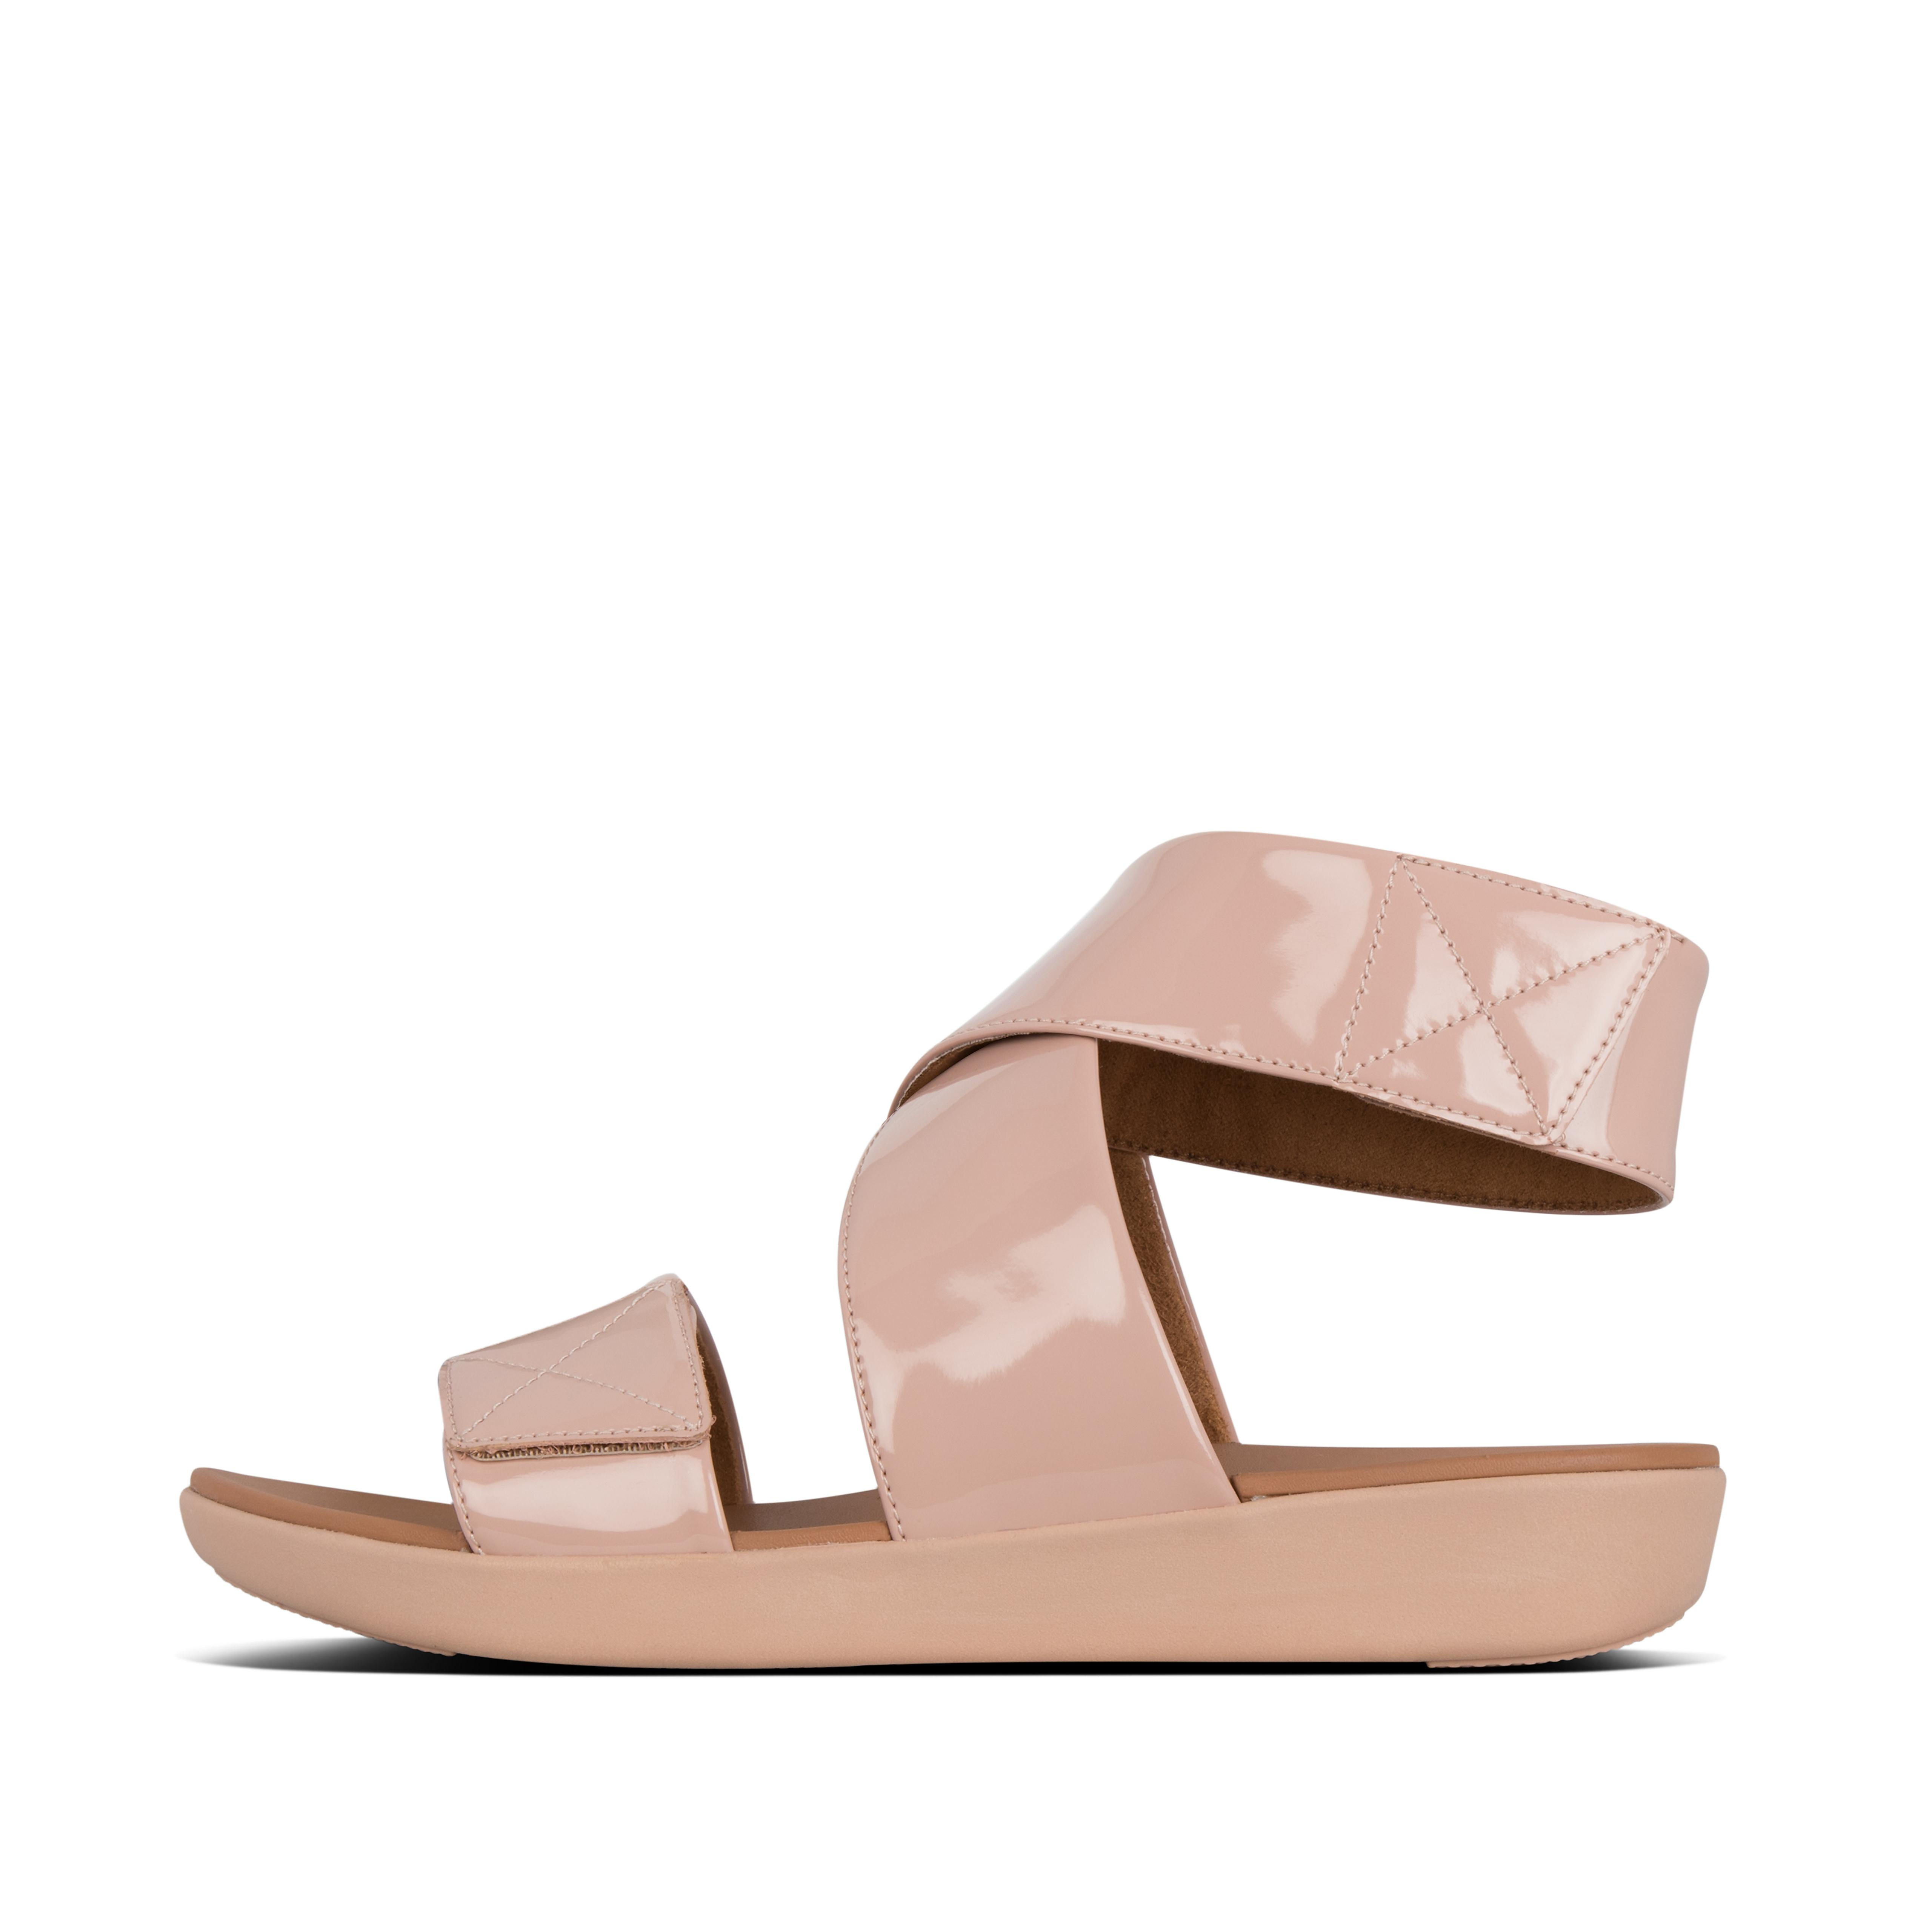 Carin patent back strap sandals beechwood w64 734?v=3